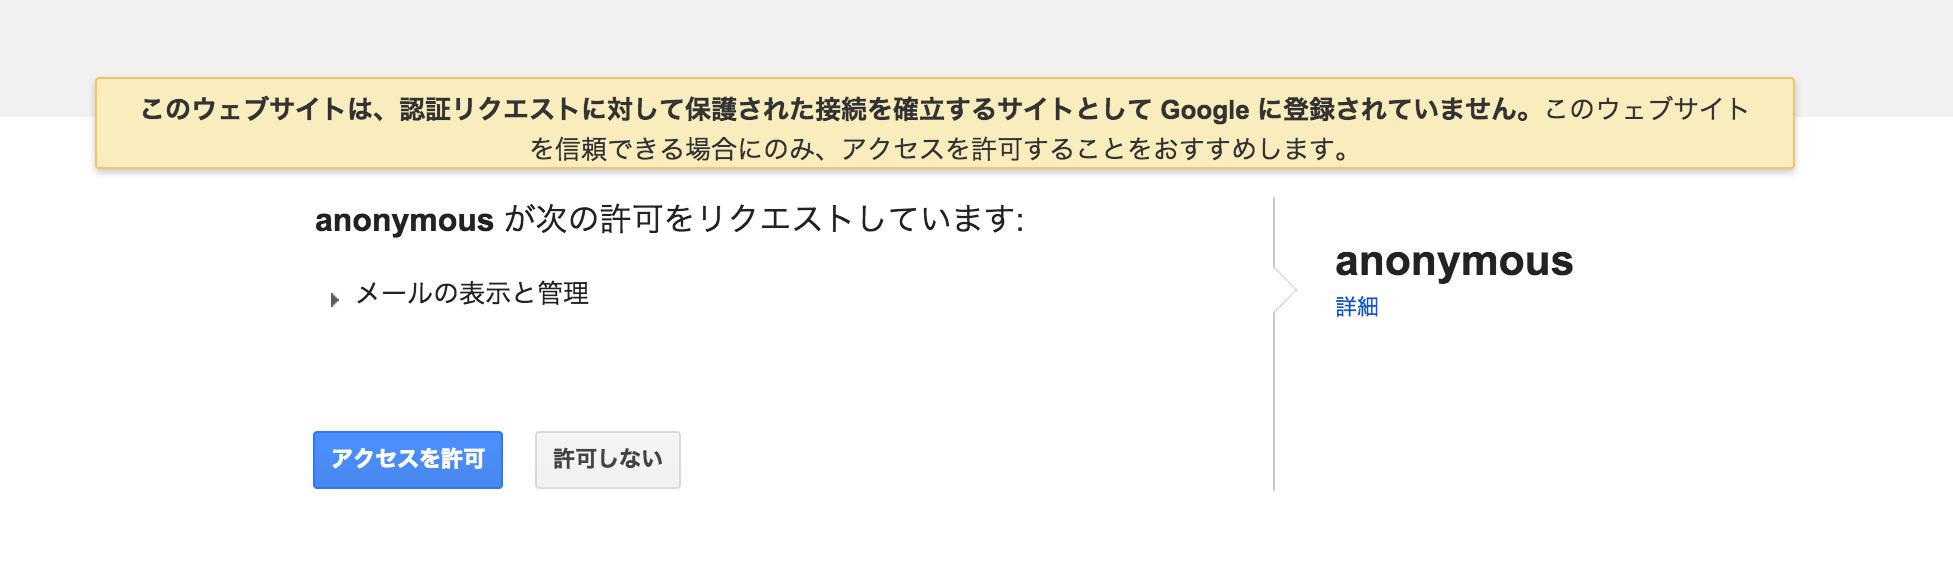 Google OAuth認証承認ページ